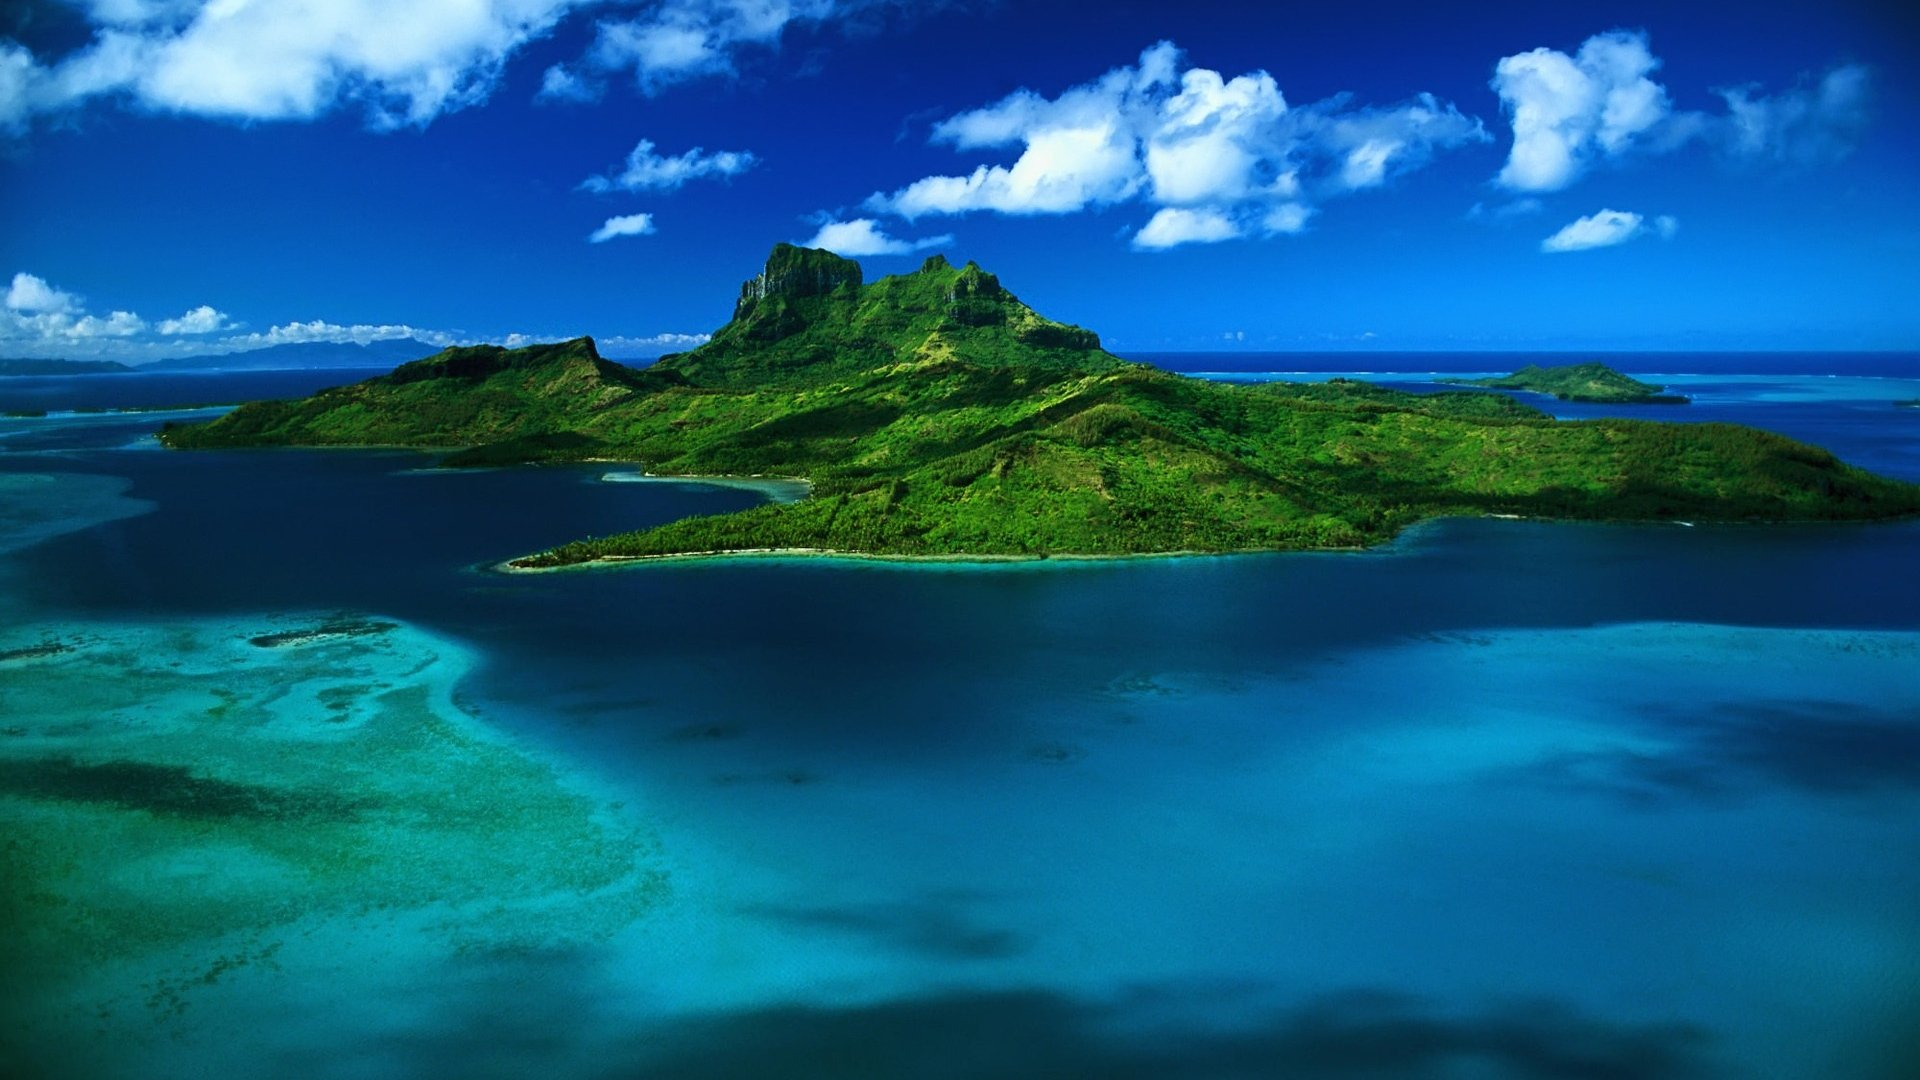 Download Wallpaper 1920x1080 island greens ocean water tropics 1920x1080